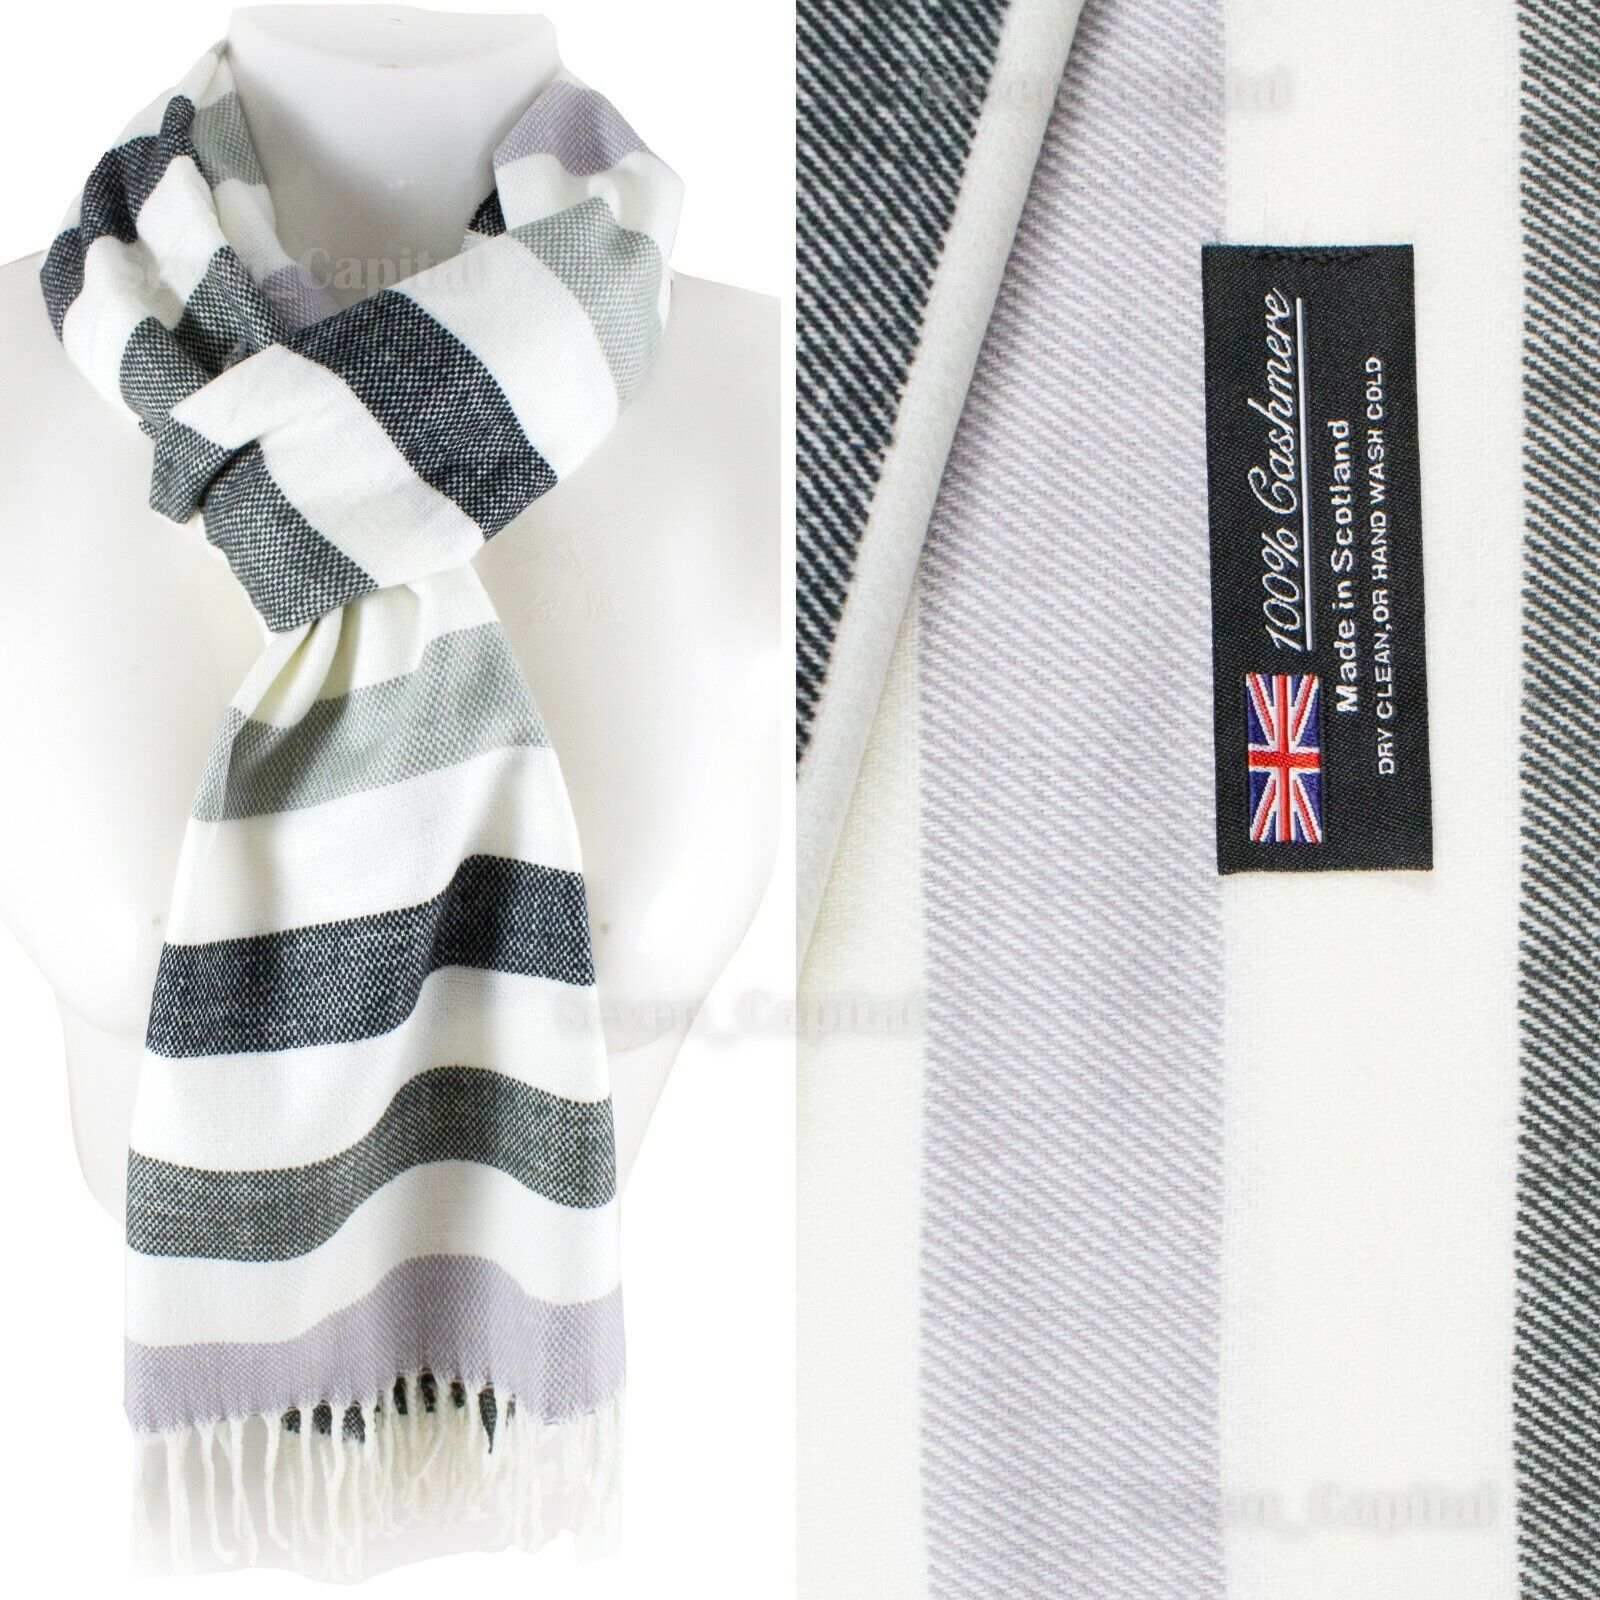 Mens Womens Winter Warm SCOTLAND Made 100% CASHMERE Scarf Scarves Plaid Wool 27. Plaid: Black White Strip